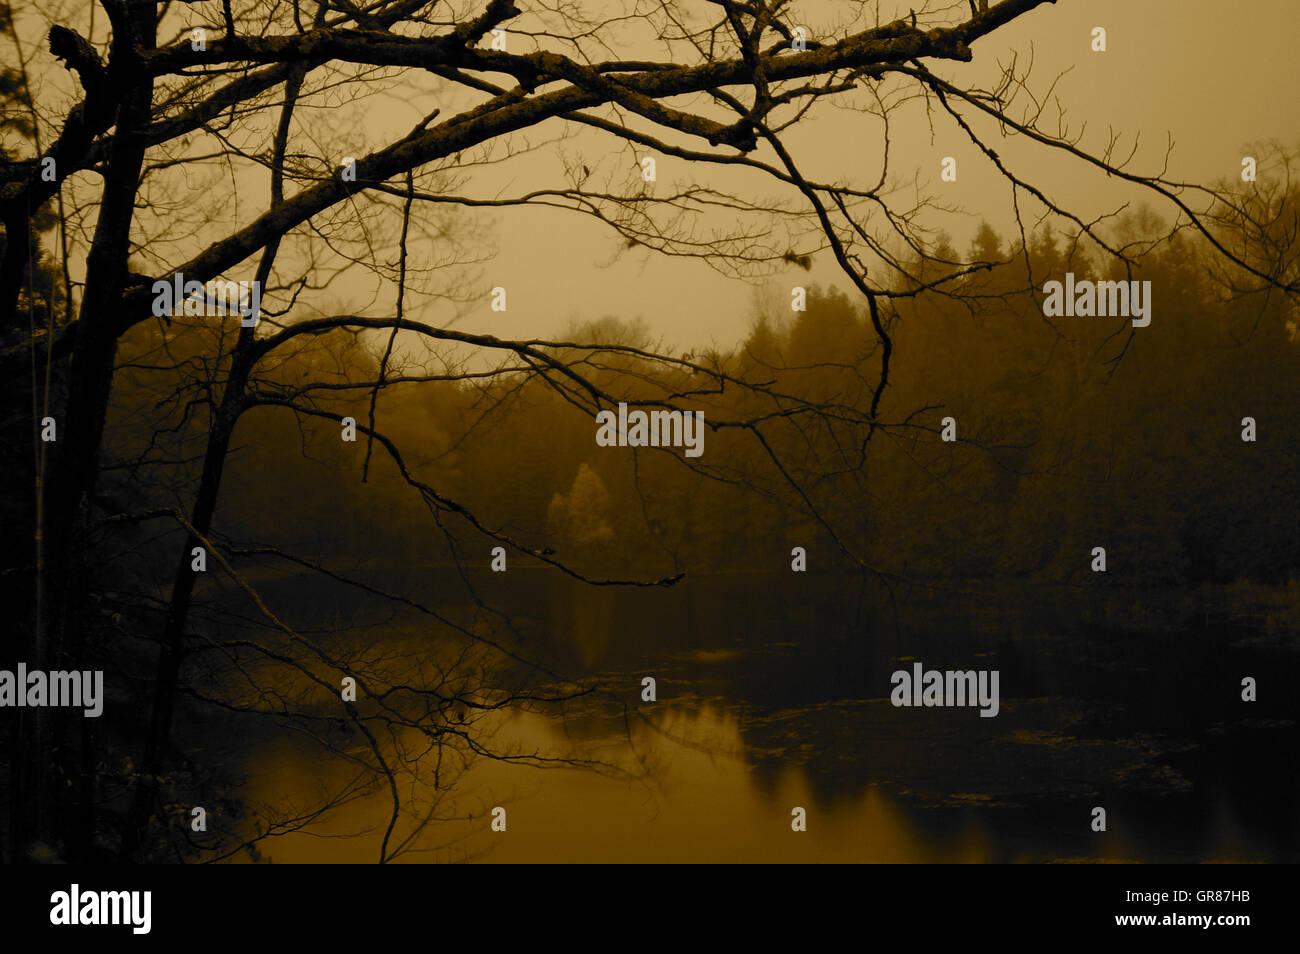 dusk by the lake - Stock Image